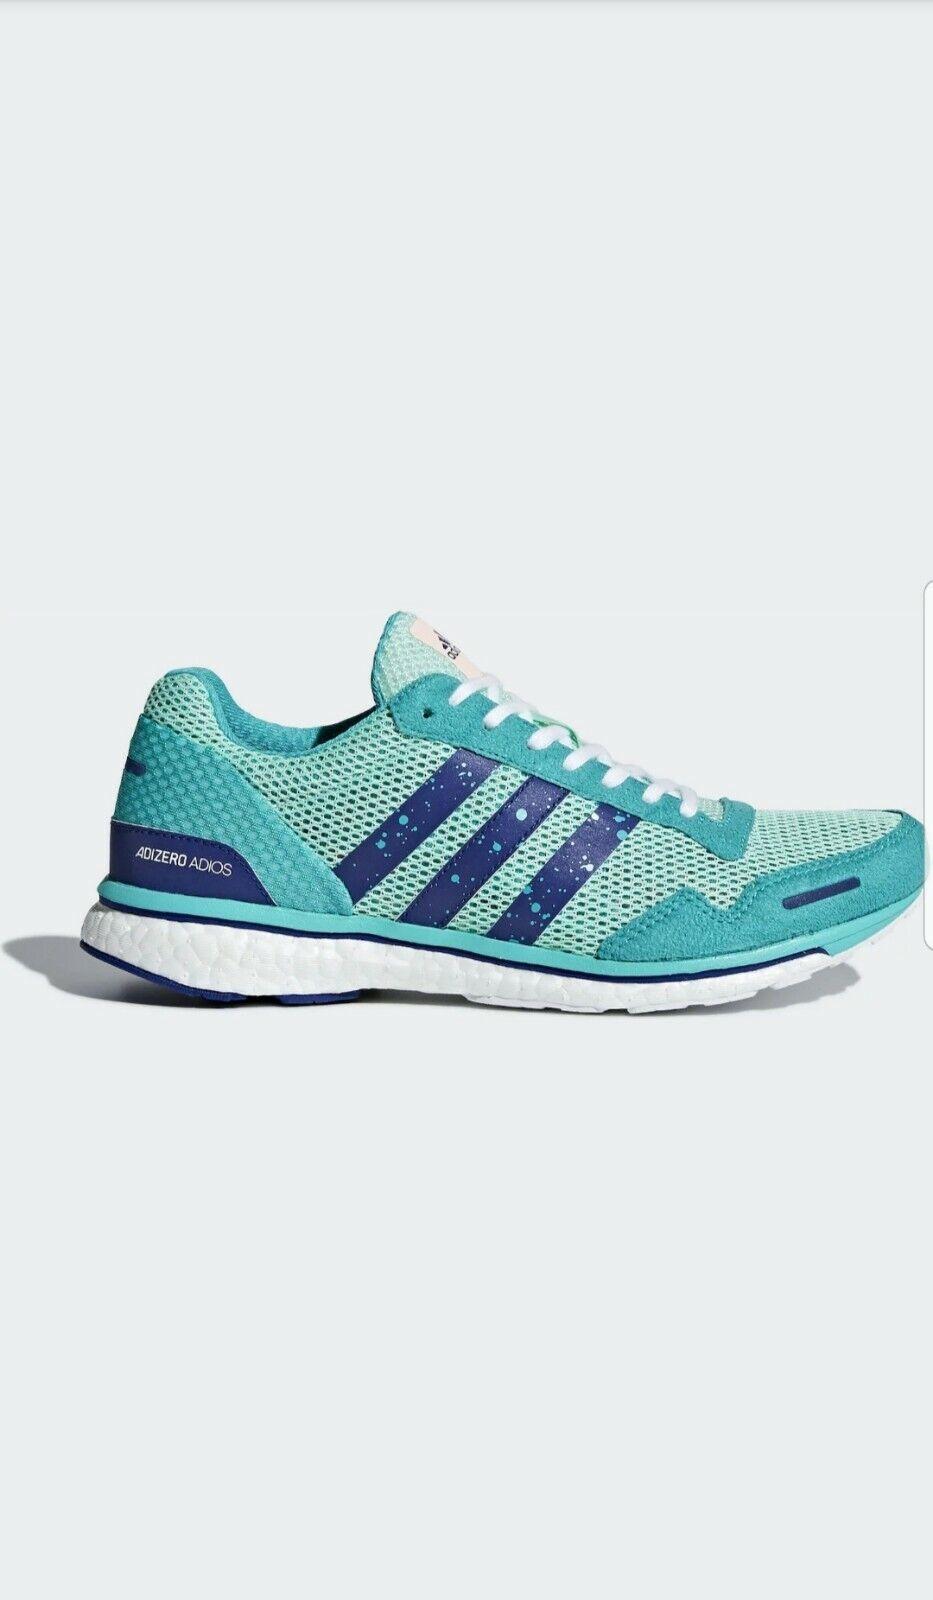 Adidas Adizero Adios 3 --afmeting UK5